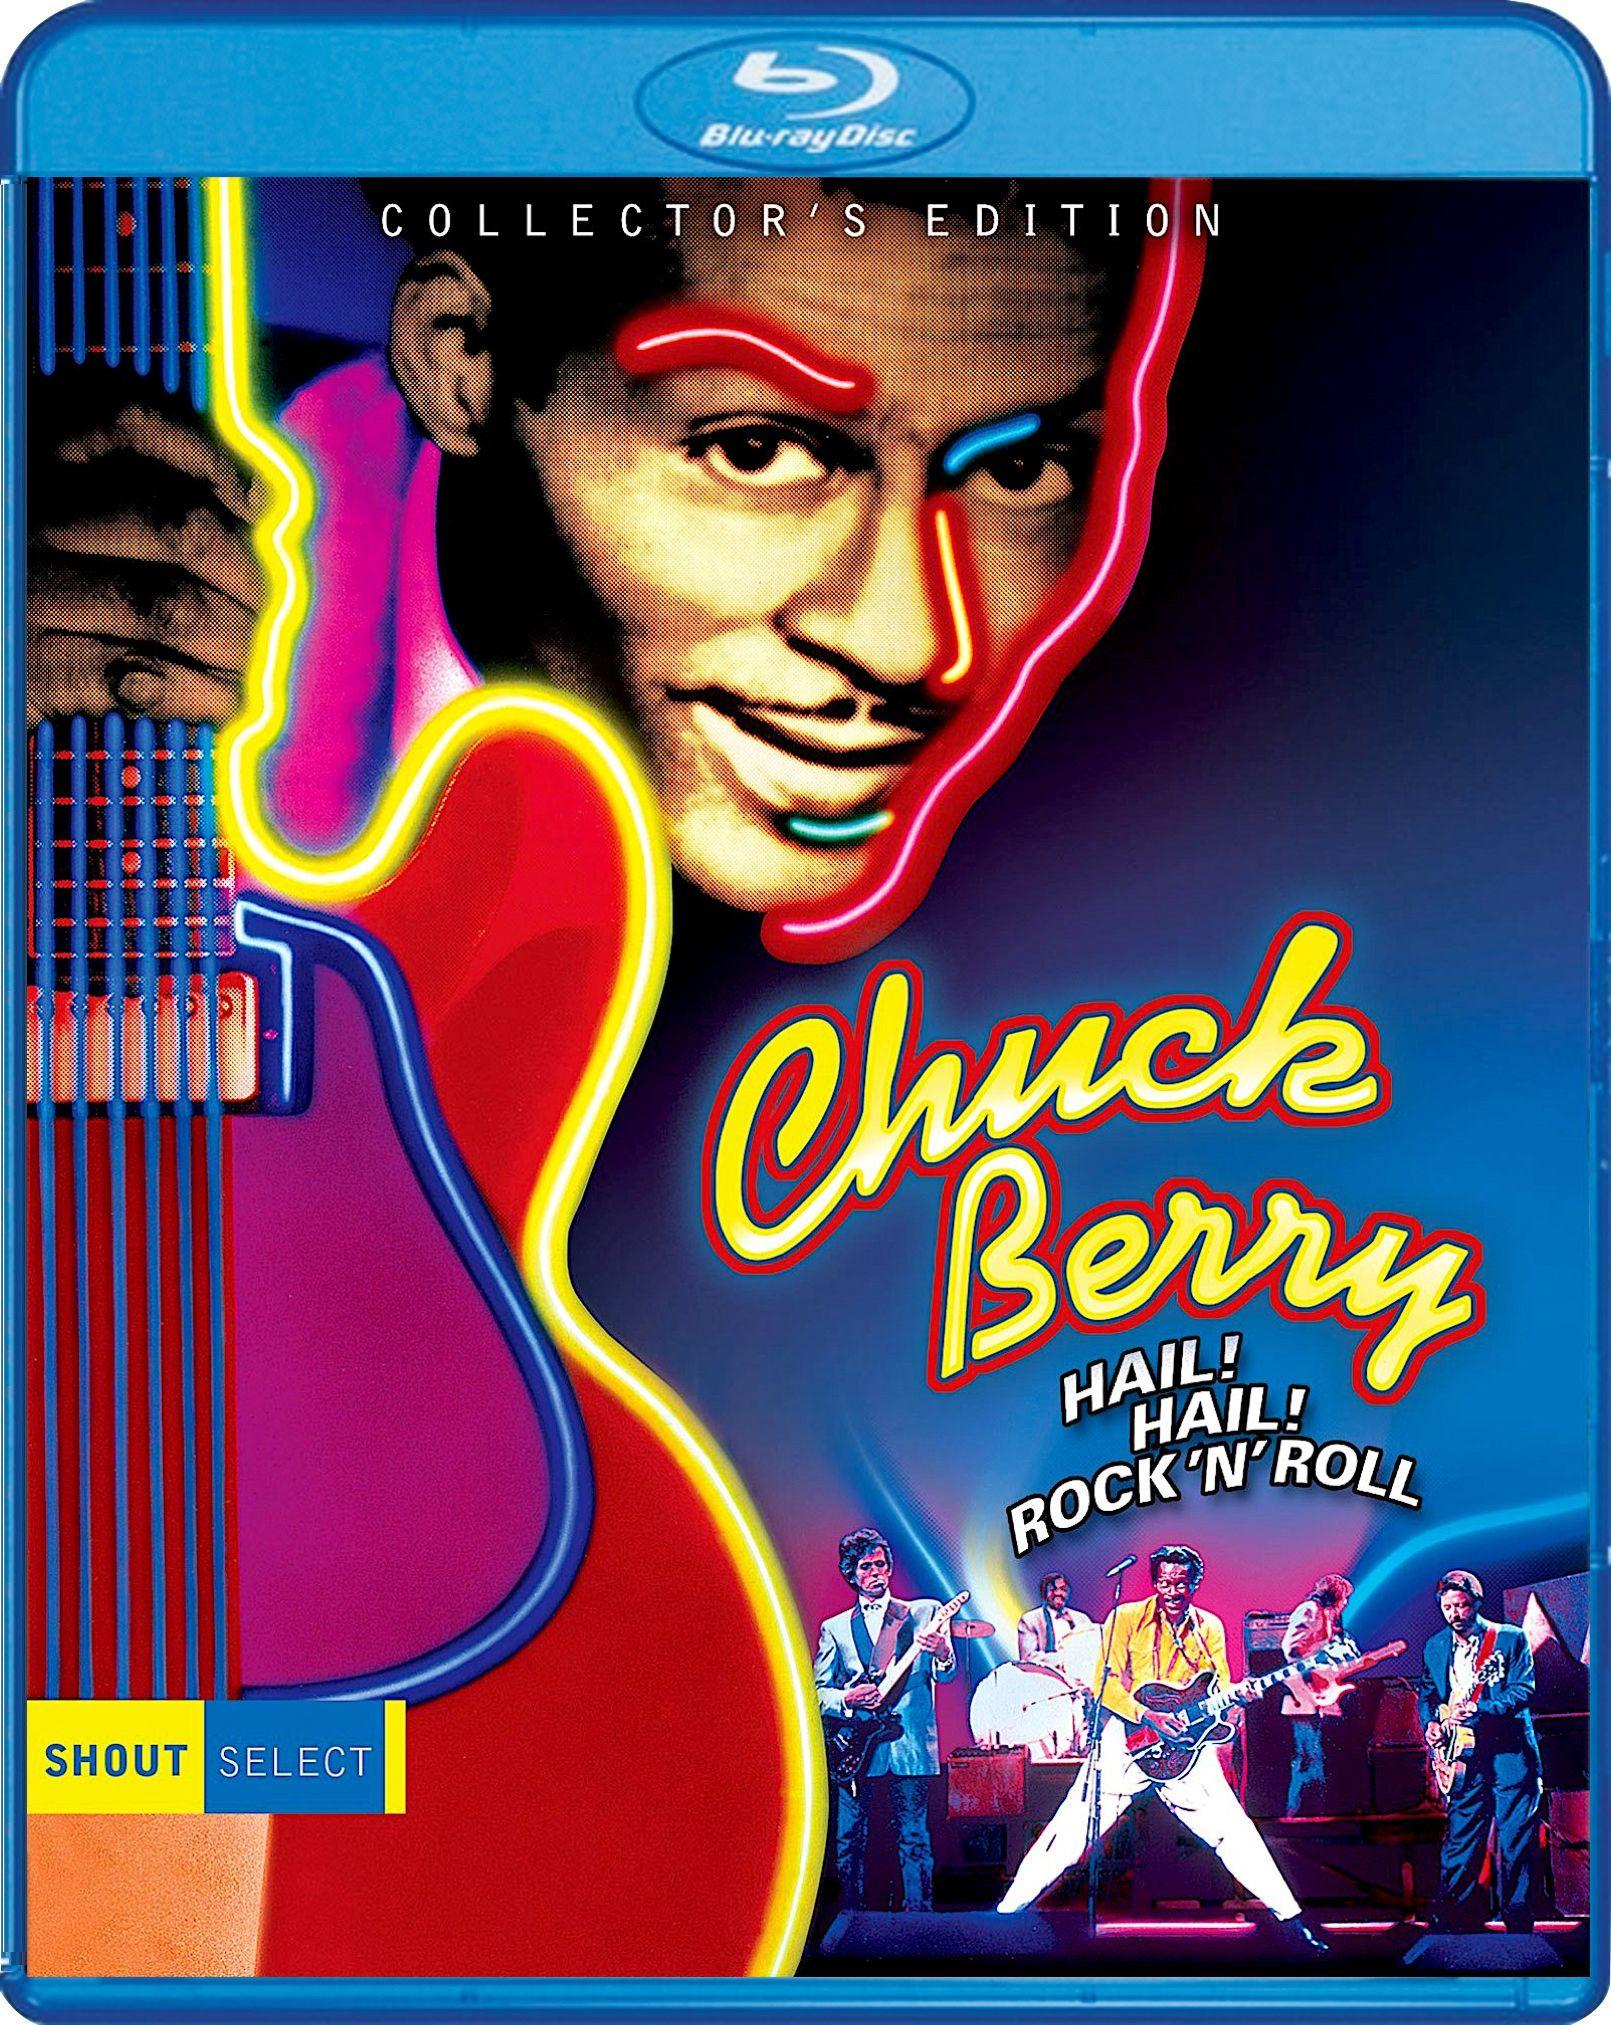 CHUCK BERRY HAIL! HAIL! ROCK 'N' ROLL COLLECTOR'S EDITION